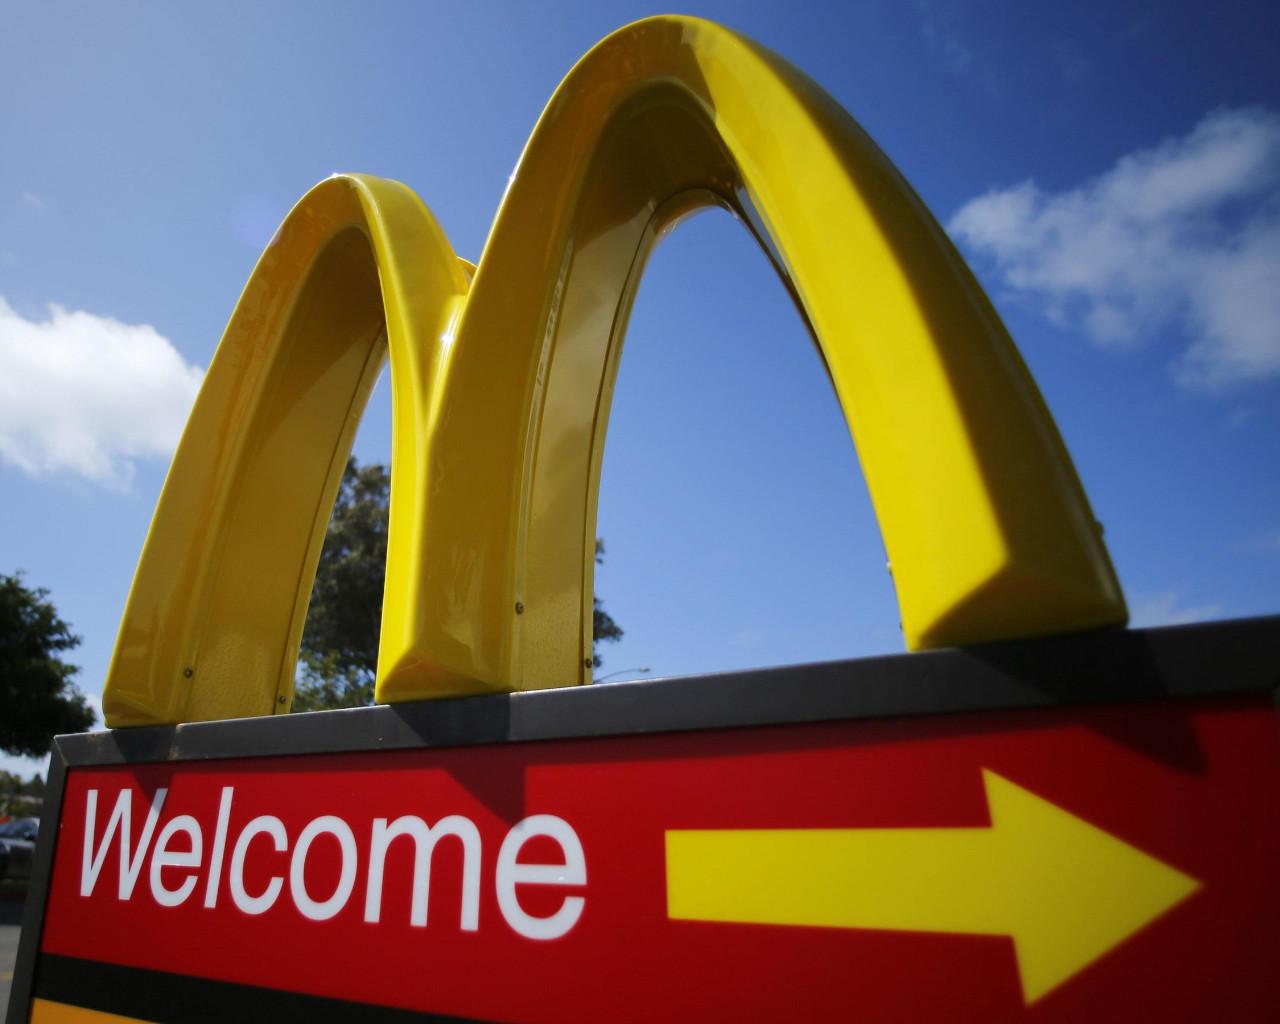 McDonald's,mcdonald's menu τιμεσ,mcdonald's travis scott,mcdonald's menu,mcdonald's θεσσαλονίκη,mcdonald's efood,mcdonald's,mcdonald's delivery,mcdonald's ίλιον,mcdonald's καταστήματα